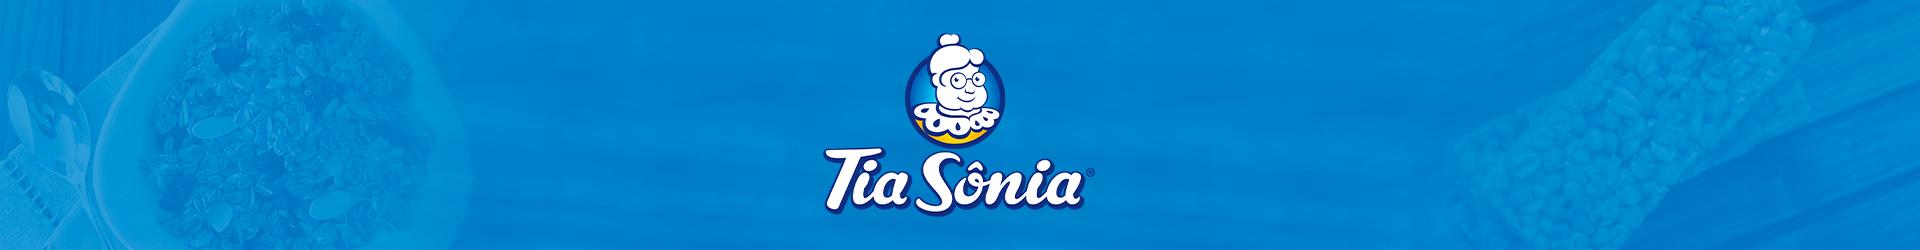 MARCA - Tia Sônia